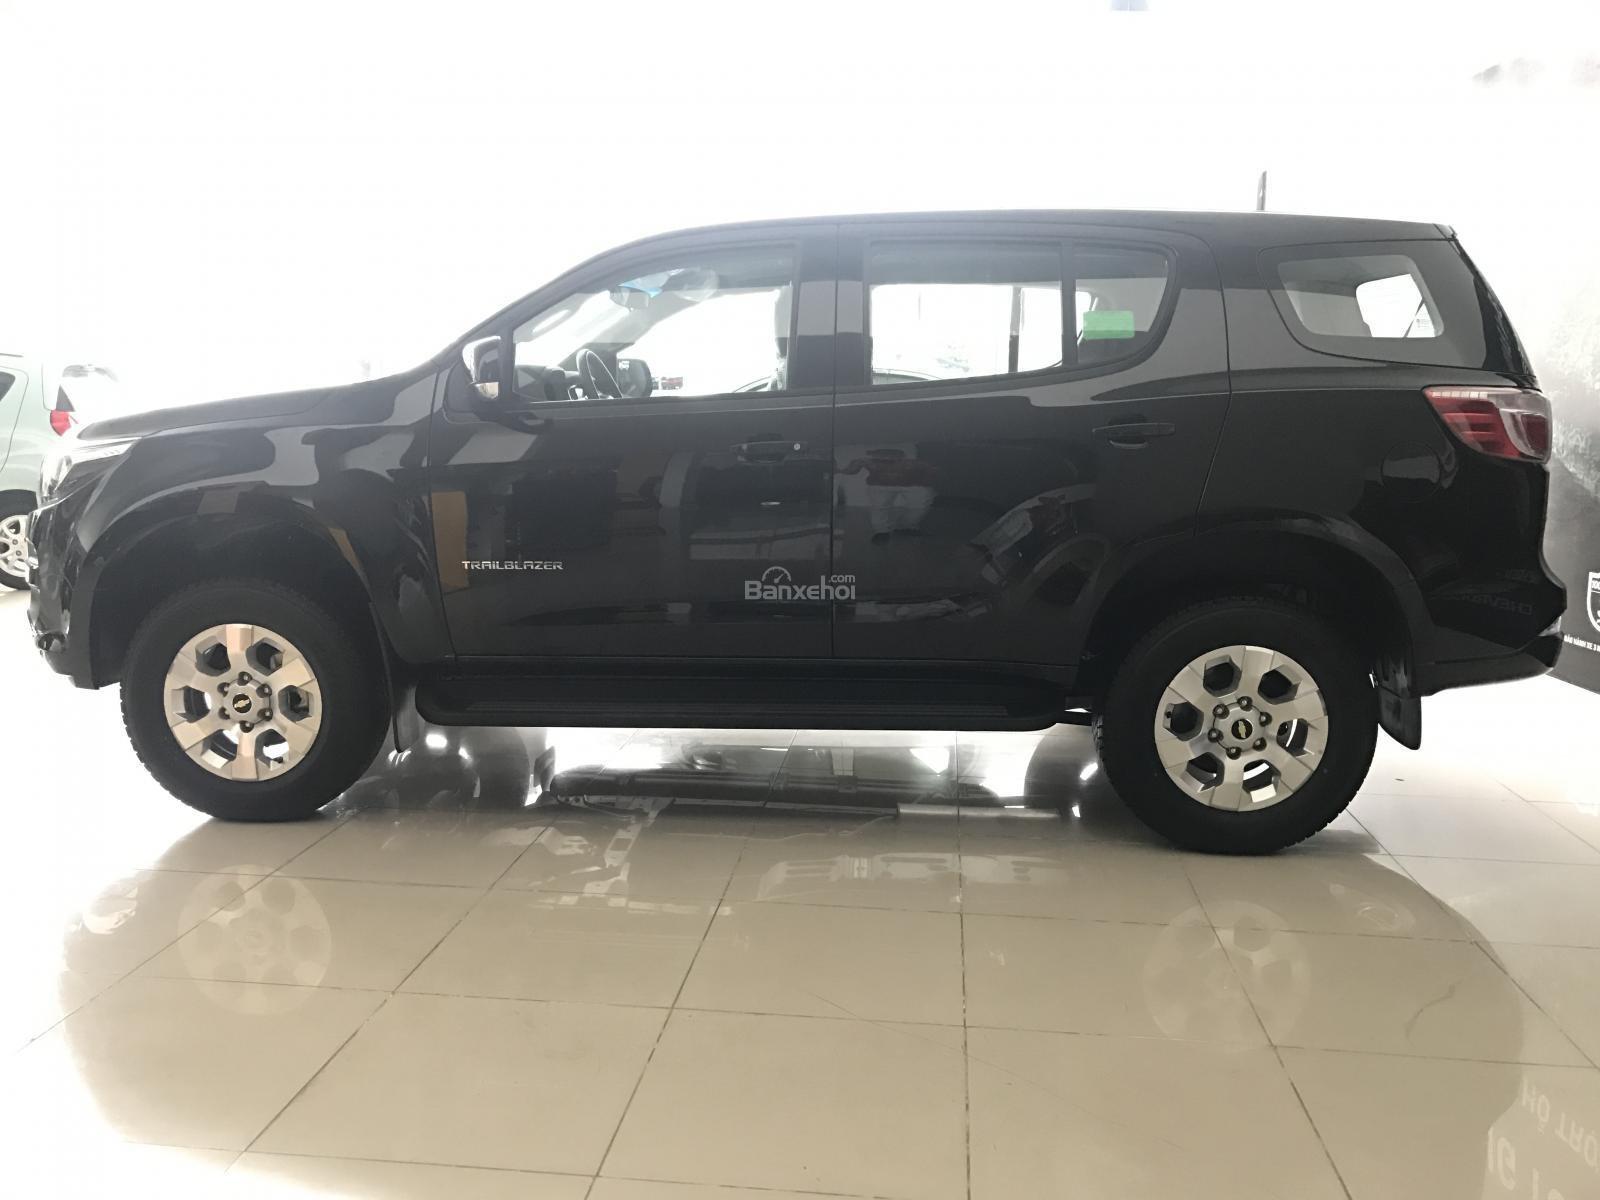 Mẫu SUV 07 chỗ Chevrolet Trailblazer 2.5L 4x2 AT 2018 (Nhập từ Thái Lan), lh 0963613200-3